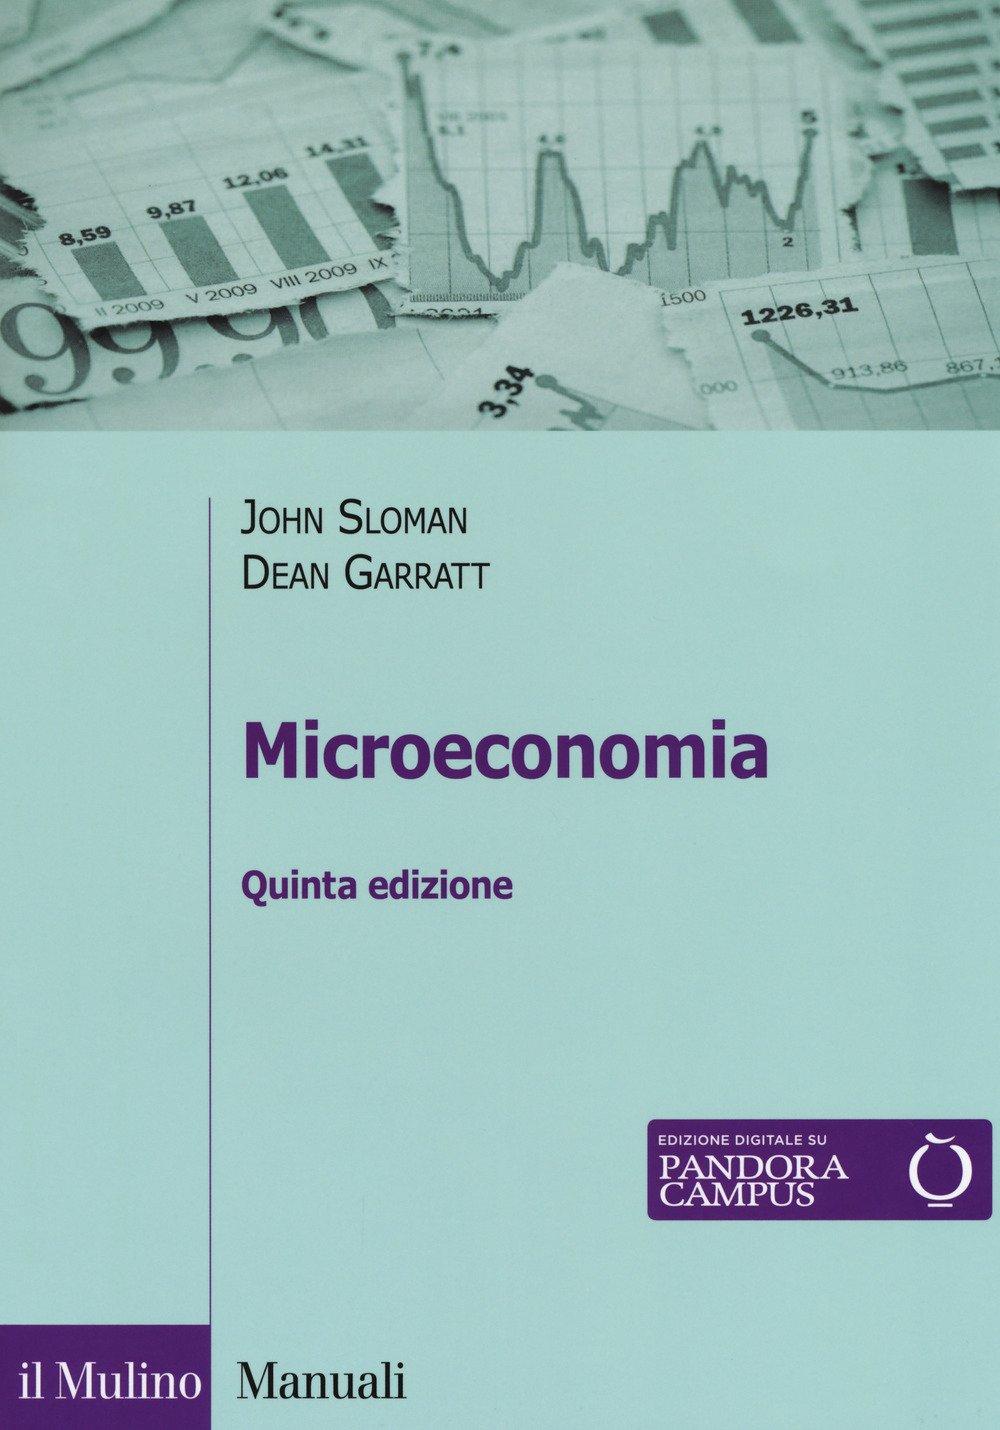 Microeconomia Sloman